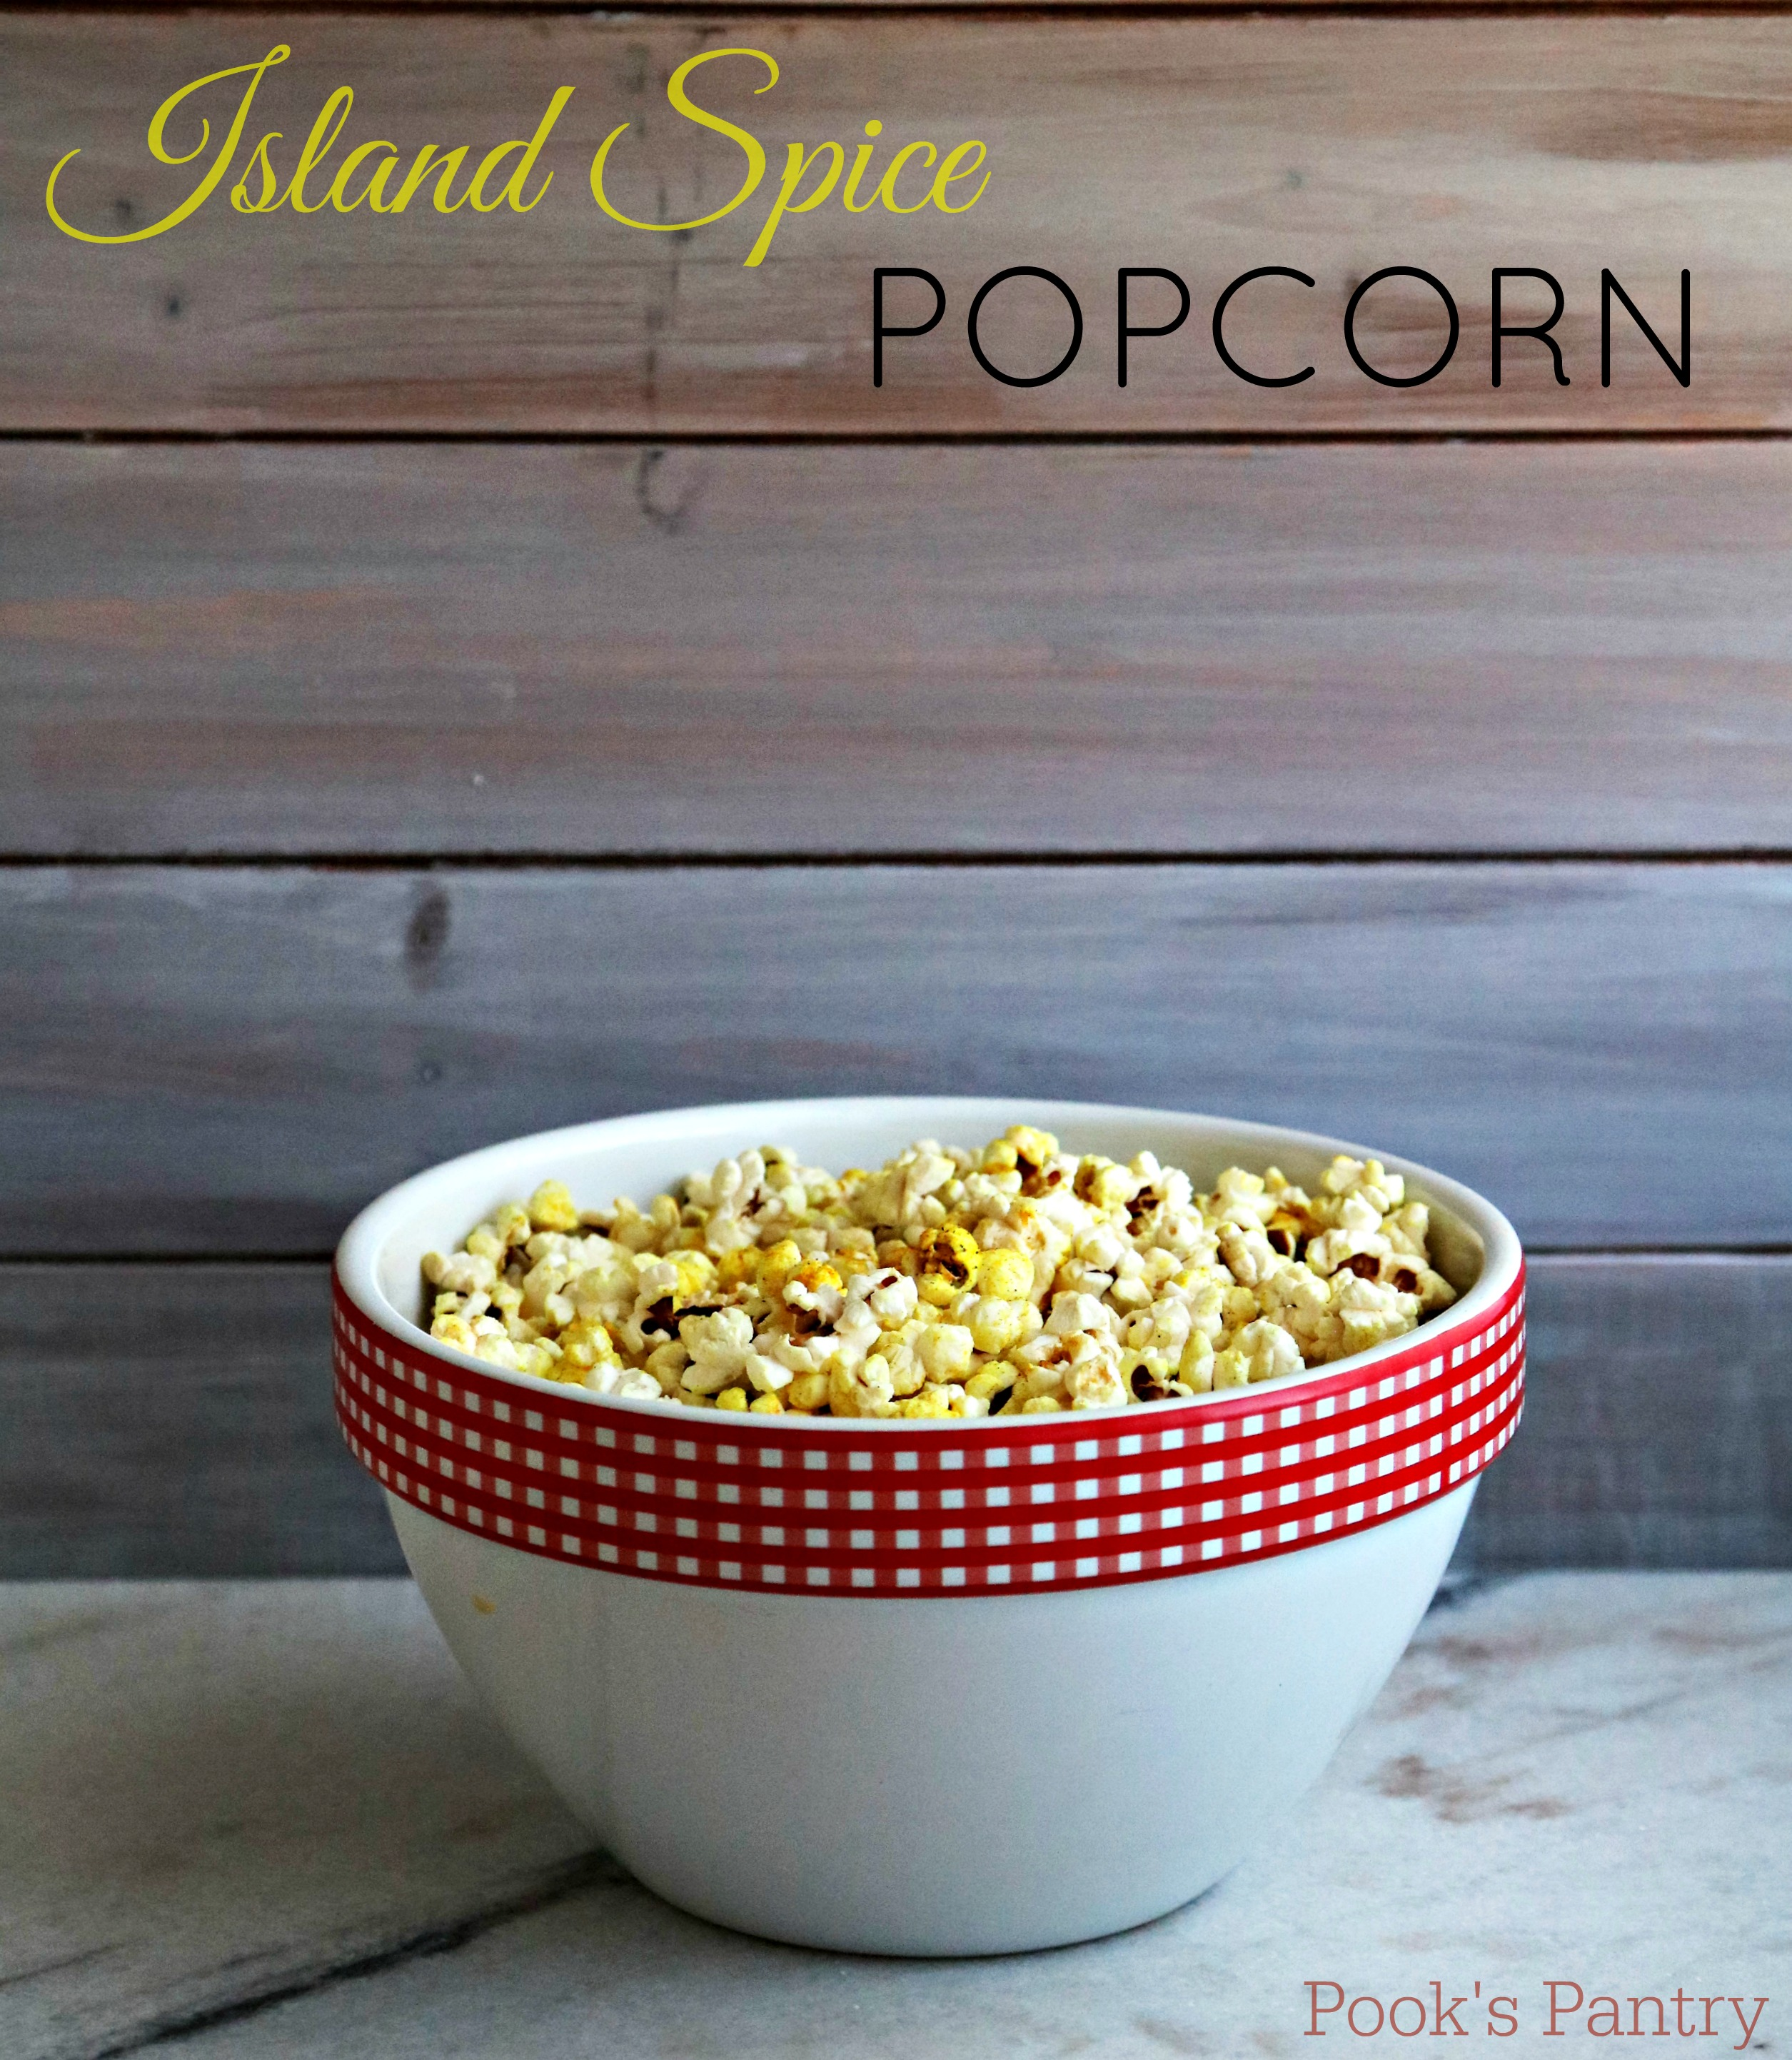 Pook's Pantry - Island Spice Popcorn